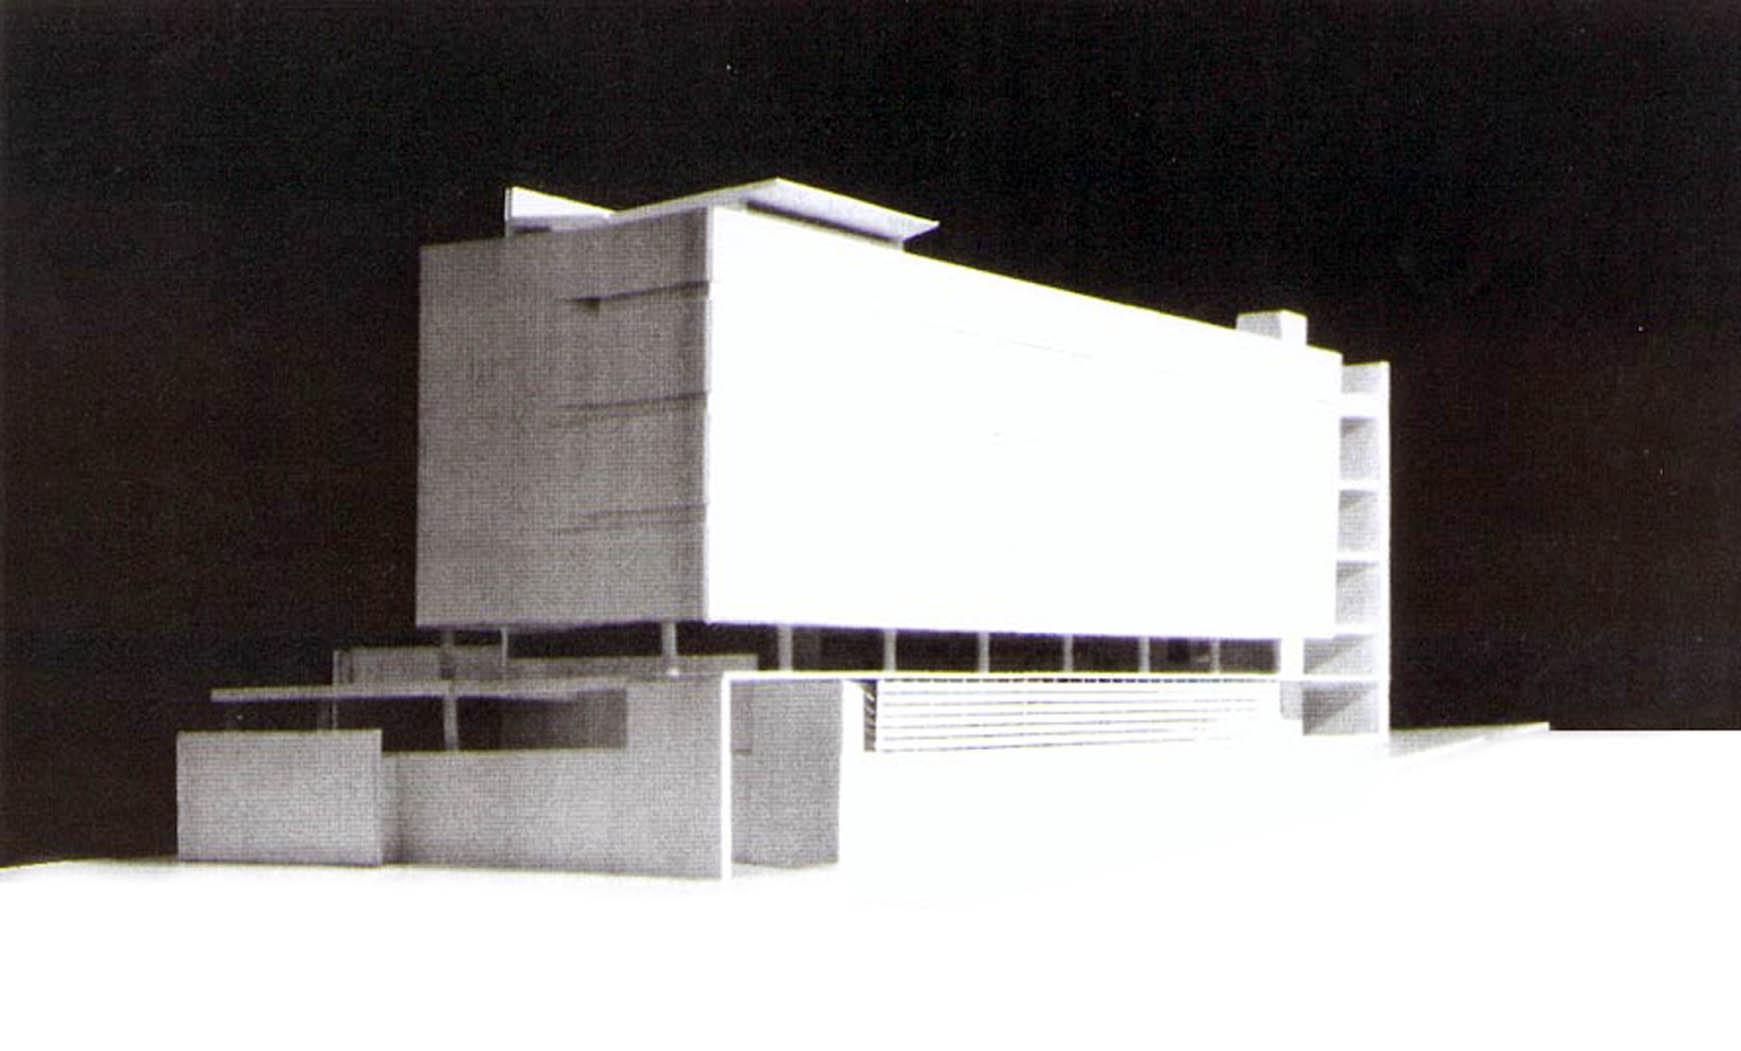 Comisaría Cuartel Girona en c. Marina, Barcelona. Proy. ejecutivo, 1992. En colab. con EGC/ABS